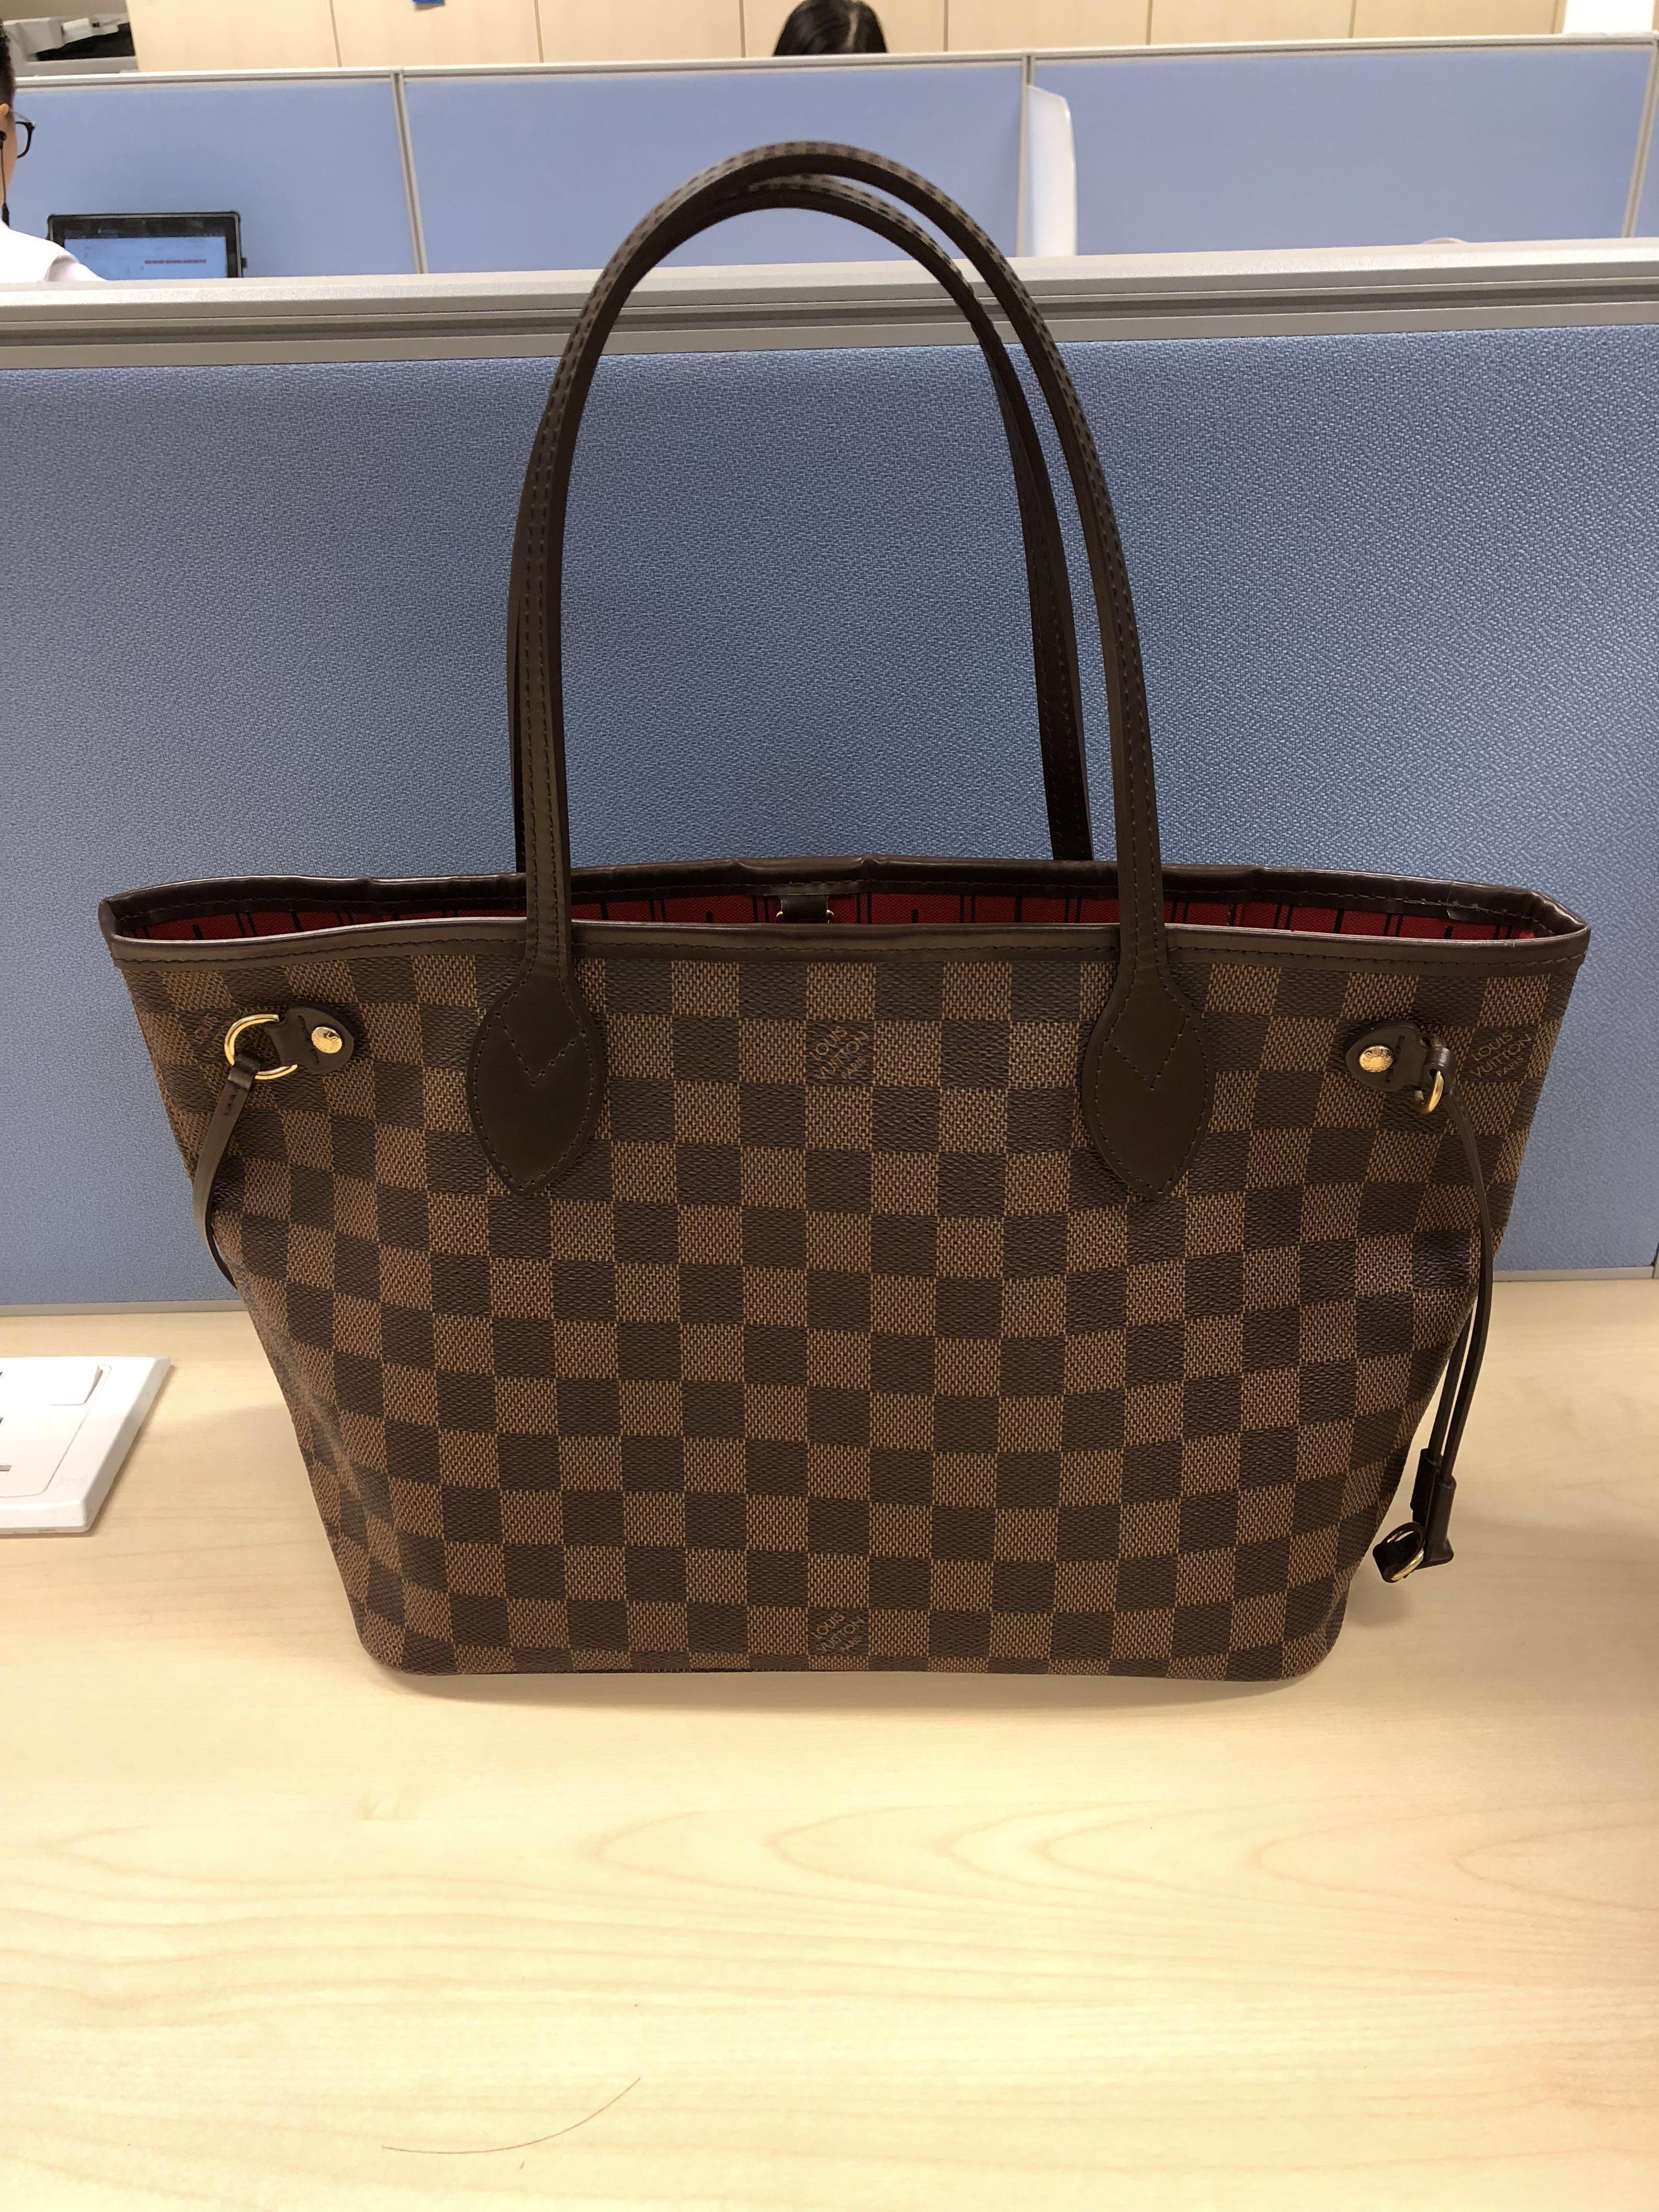 73c28a4e3673 Louis Vuitton Damier Neverfull PM Bag